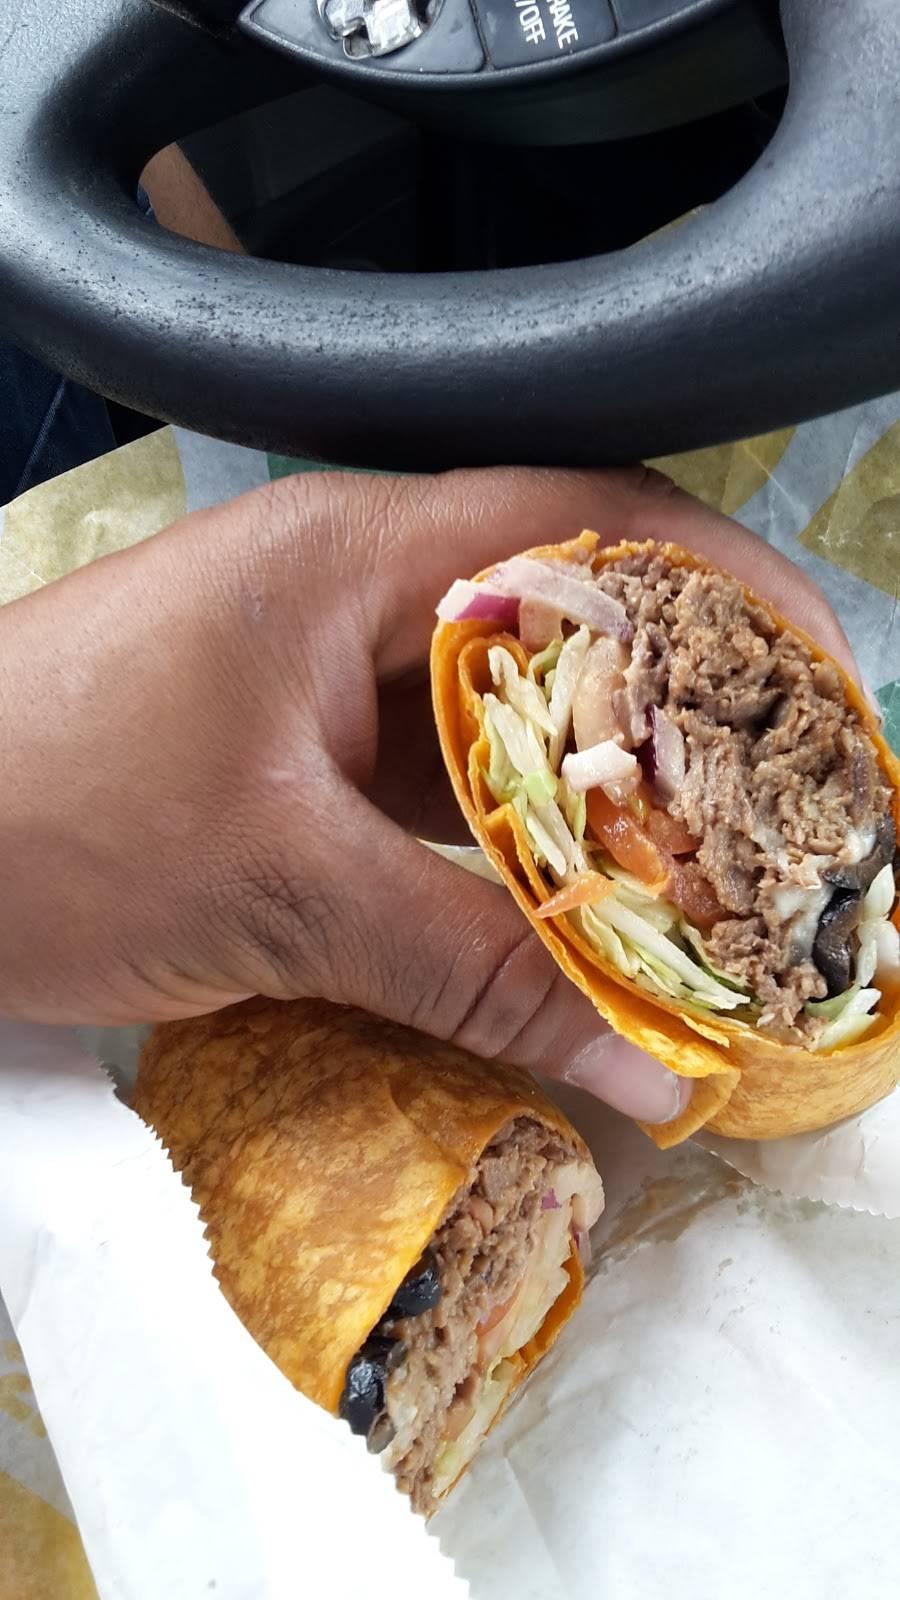 Subway | meal takeaway | 3617 Coteau Rd, New Iberia, LA 70560, USA | 3373647353 OR +1 337-364-7353